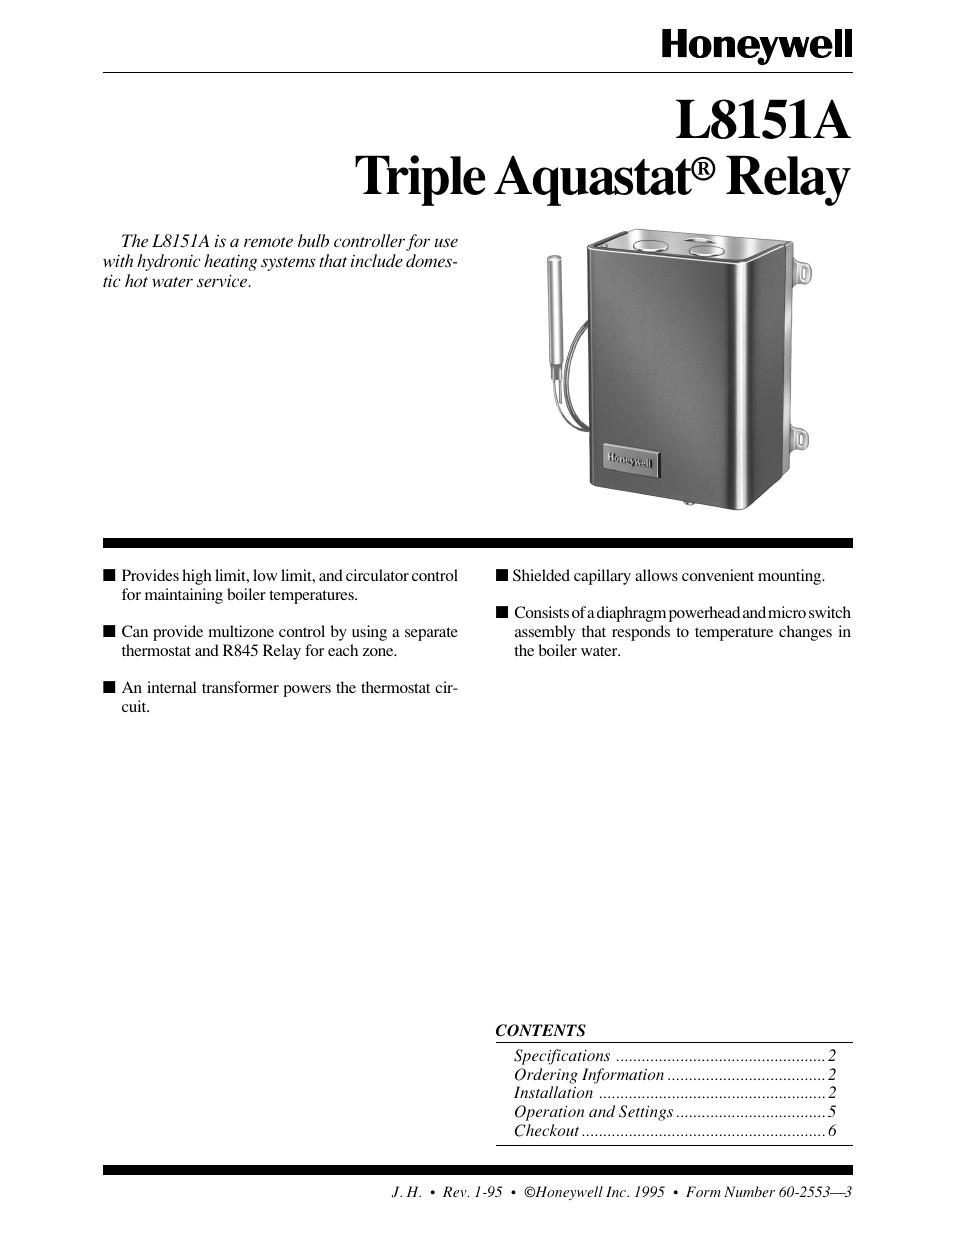 Honeywell Tripleaquastat L8151a User Manual 6 Pages Boiler Aquastat Wiring Diagram